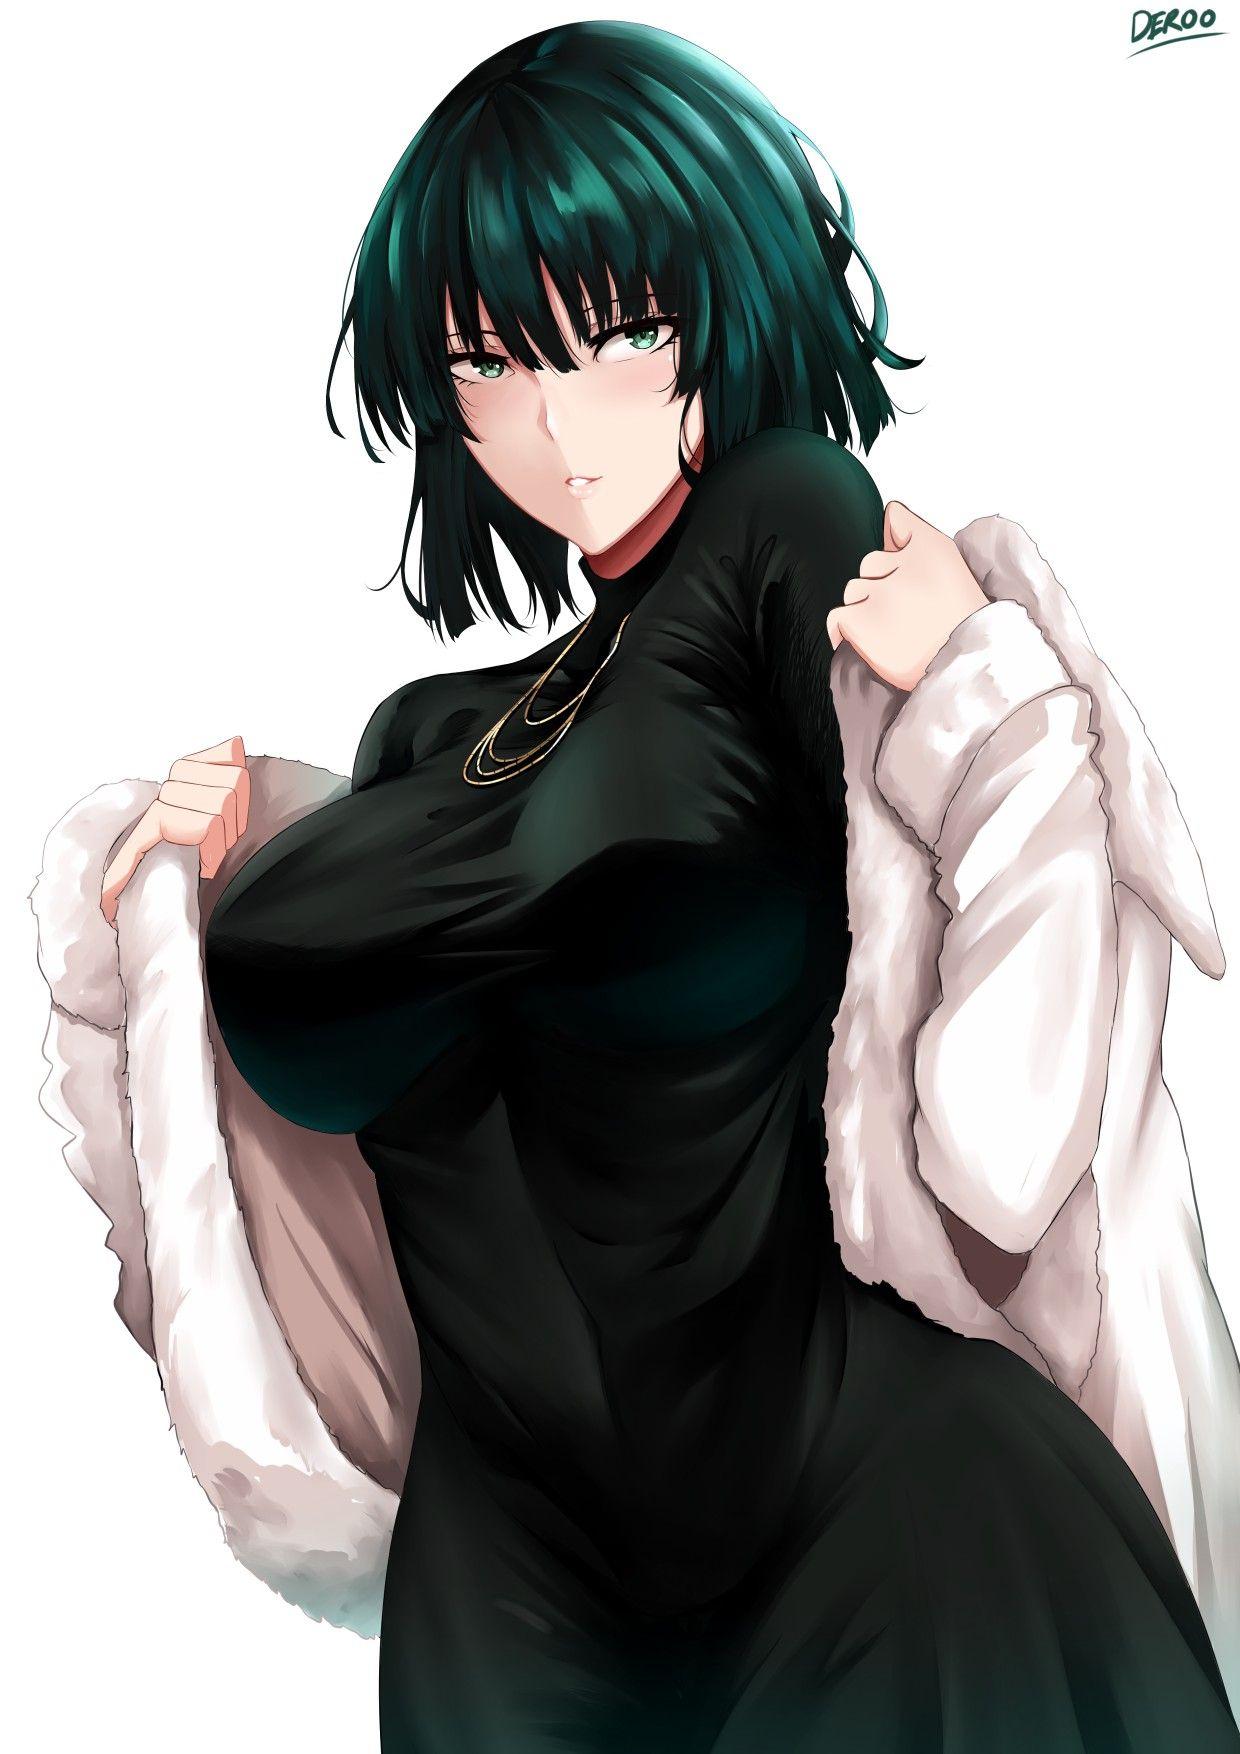 Fubuki Anime, Menina anime, Personagens de anime